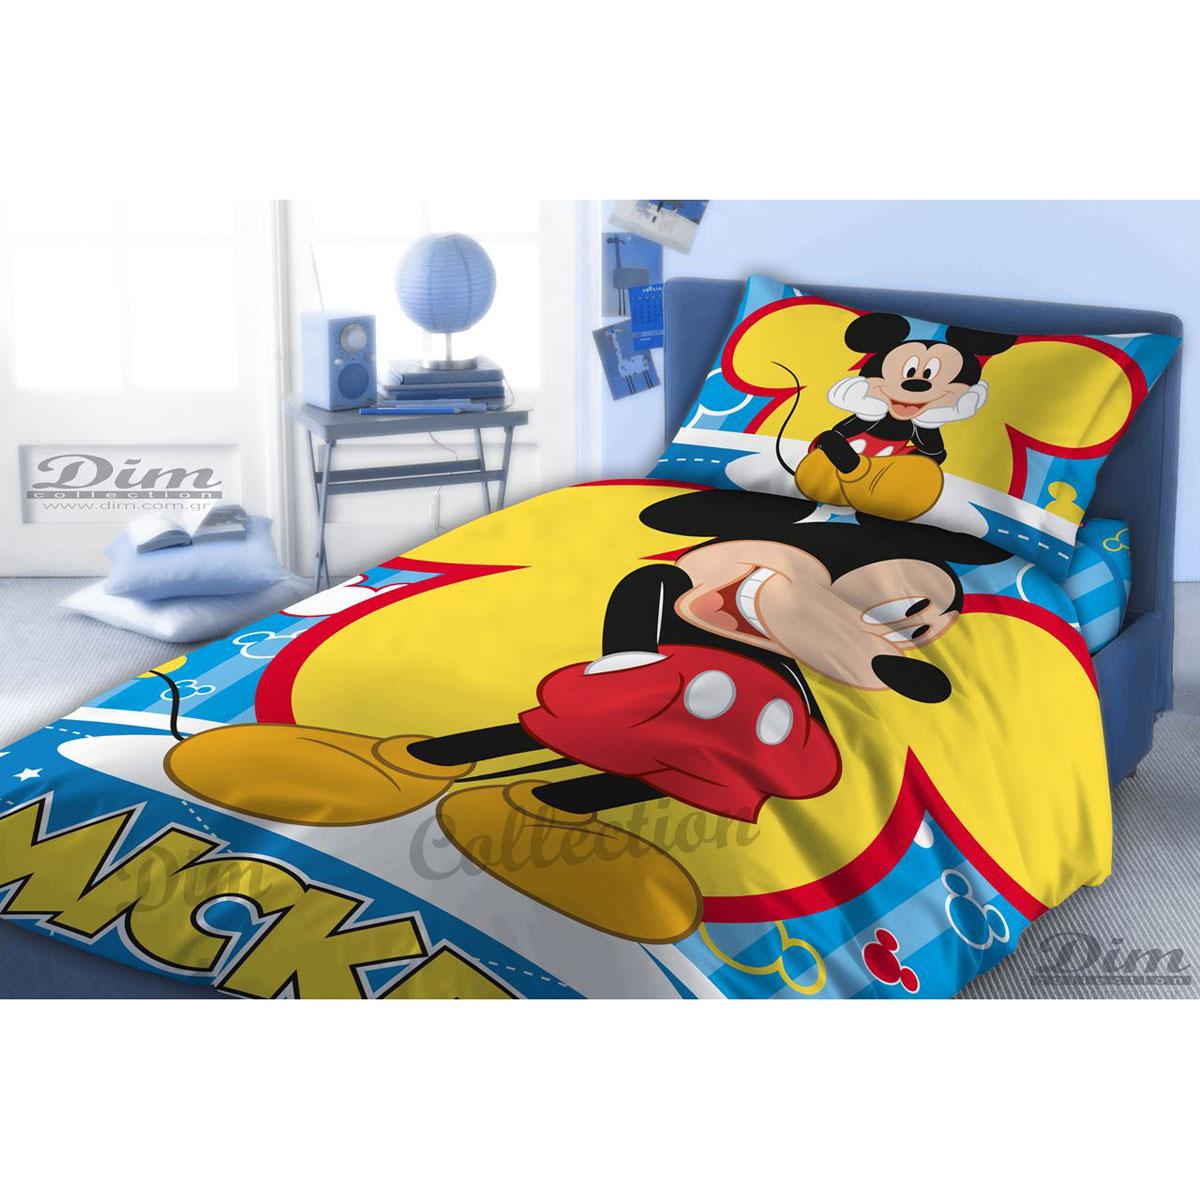 0a65235a77e Σετ σεντονια 3 τμχ (Disney Mickey 560) | Lux House | Λευκά Είδη ...